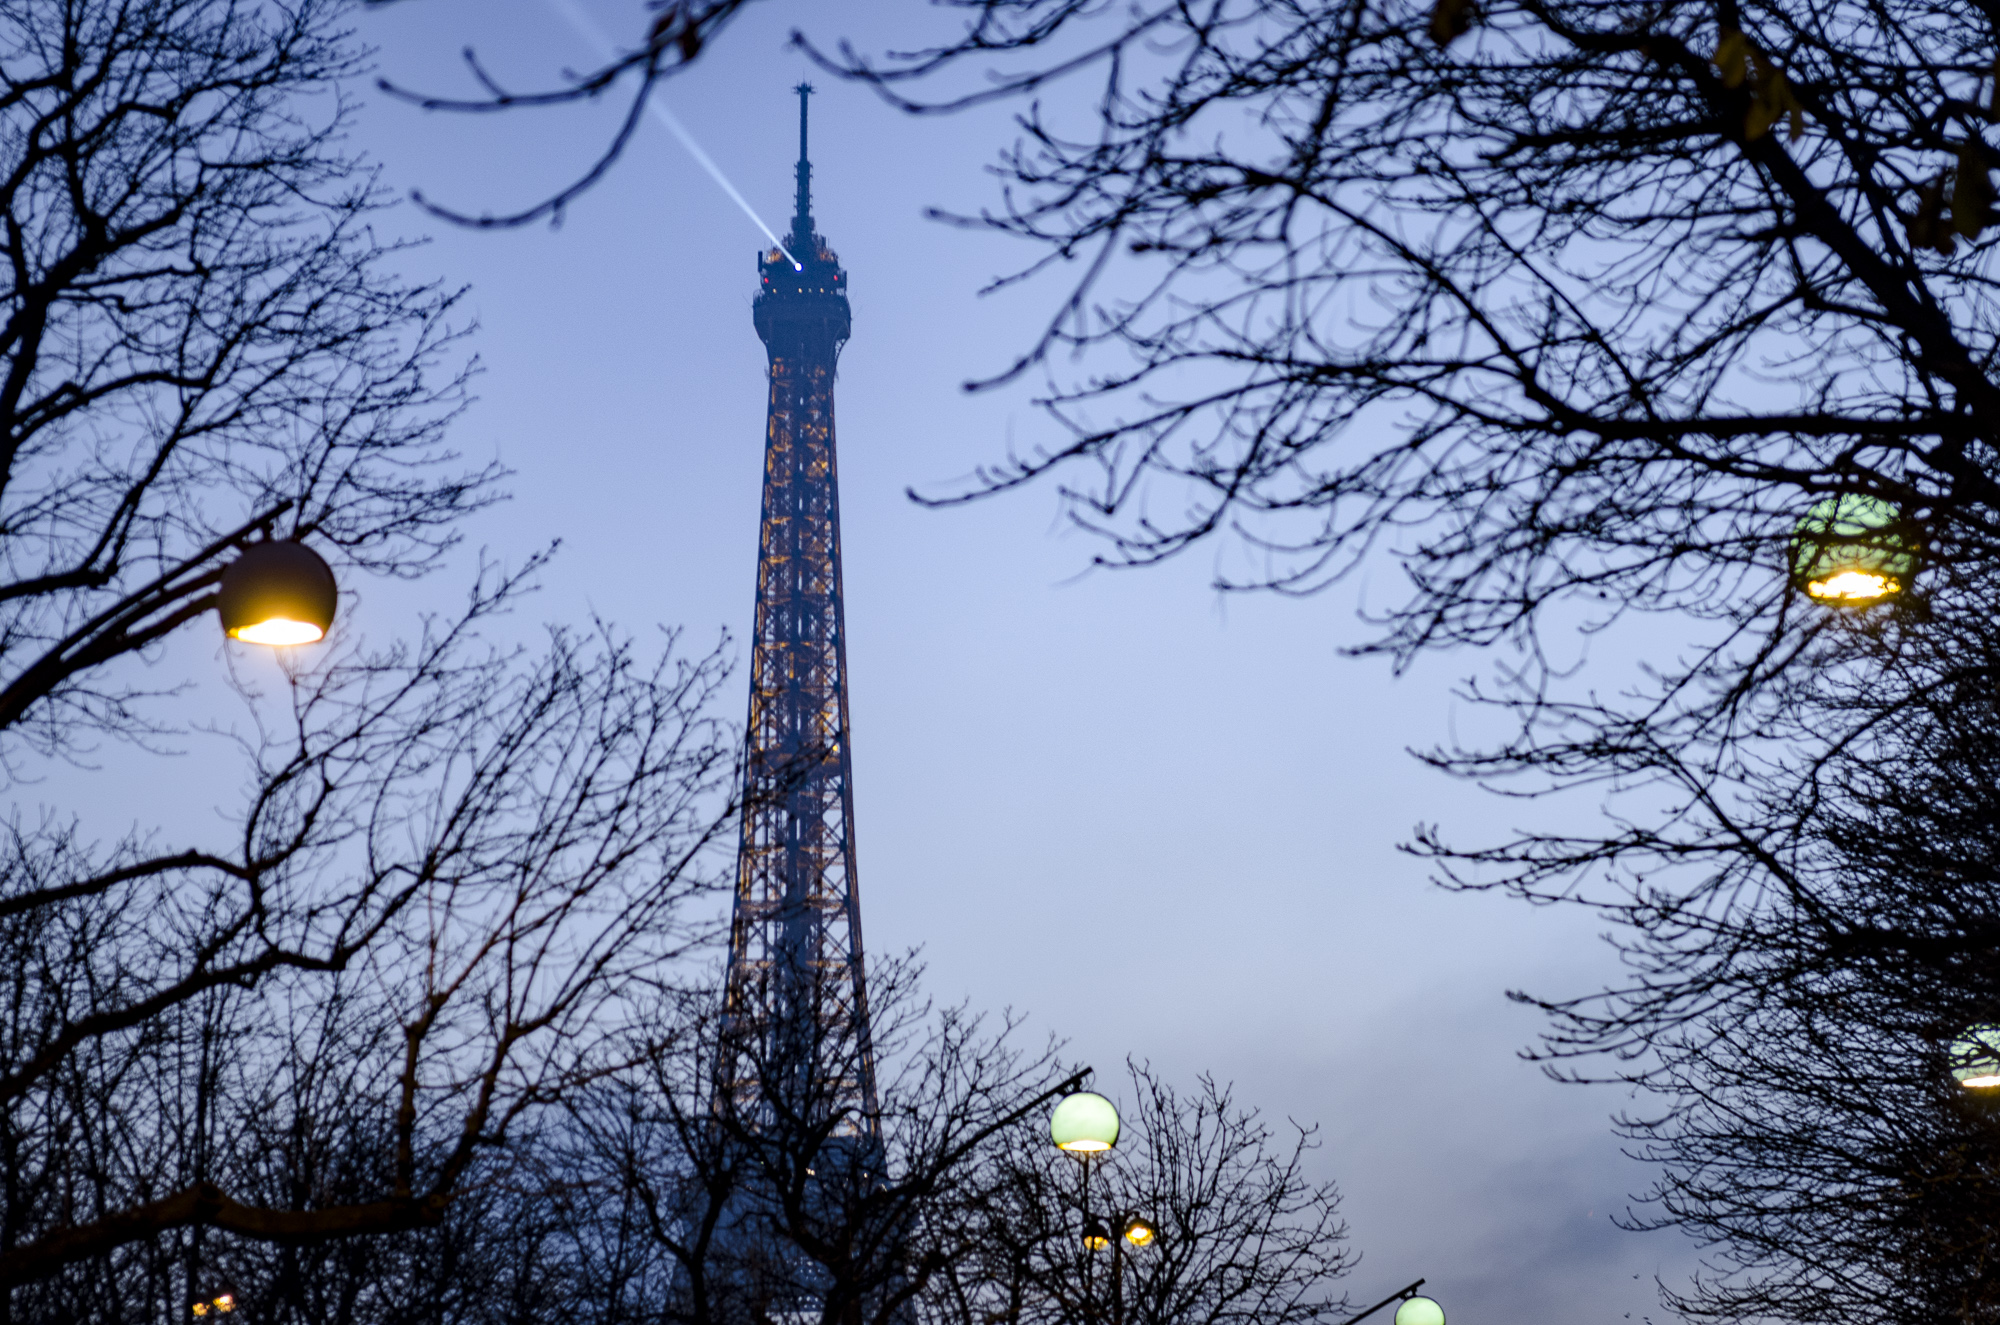 THE Eiffel Tower - Paris  PHOTOGRAPHY: ALEXANDER J.E. BRADLEY • NIKON D7000 • AF-S NIKKOR 24-70mm Ƒ/2.8G ED @ 70MM • Ƒ/2.8 • 1/80 • ISO 400